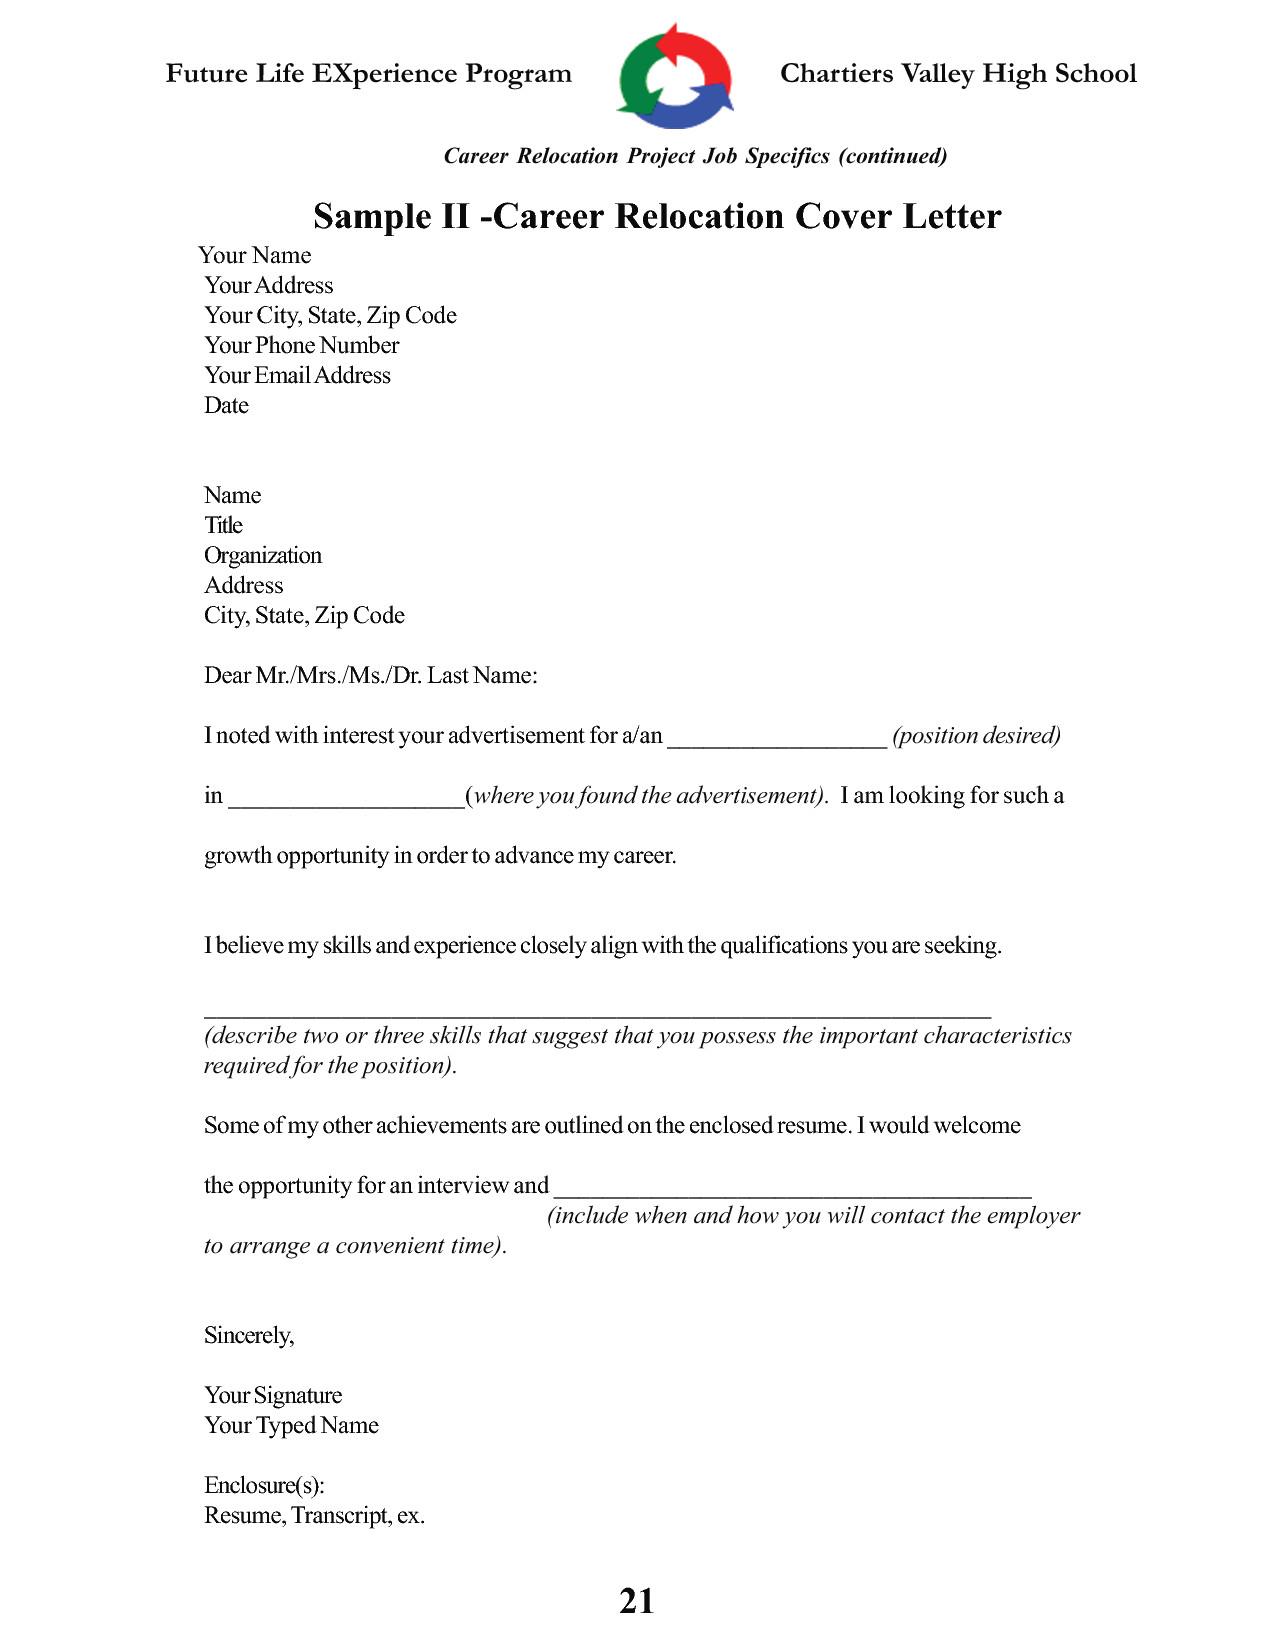 business moving letter to customers tpv0uhjyjvdmzedagkvbdq3ho 7c83pe0m0l4c6moswxre0bcddah 7ct3ucczev0z4b9bi1u8upowqs1nwo8pcjkg